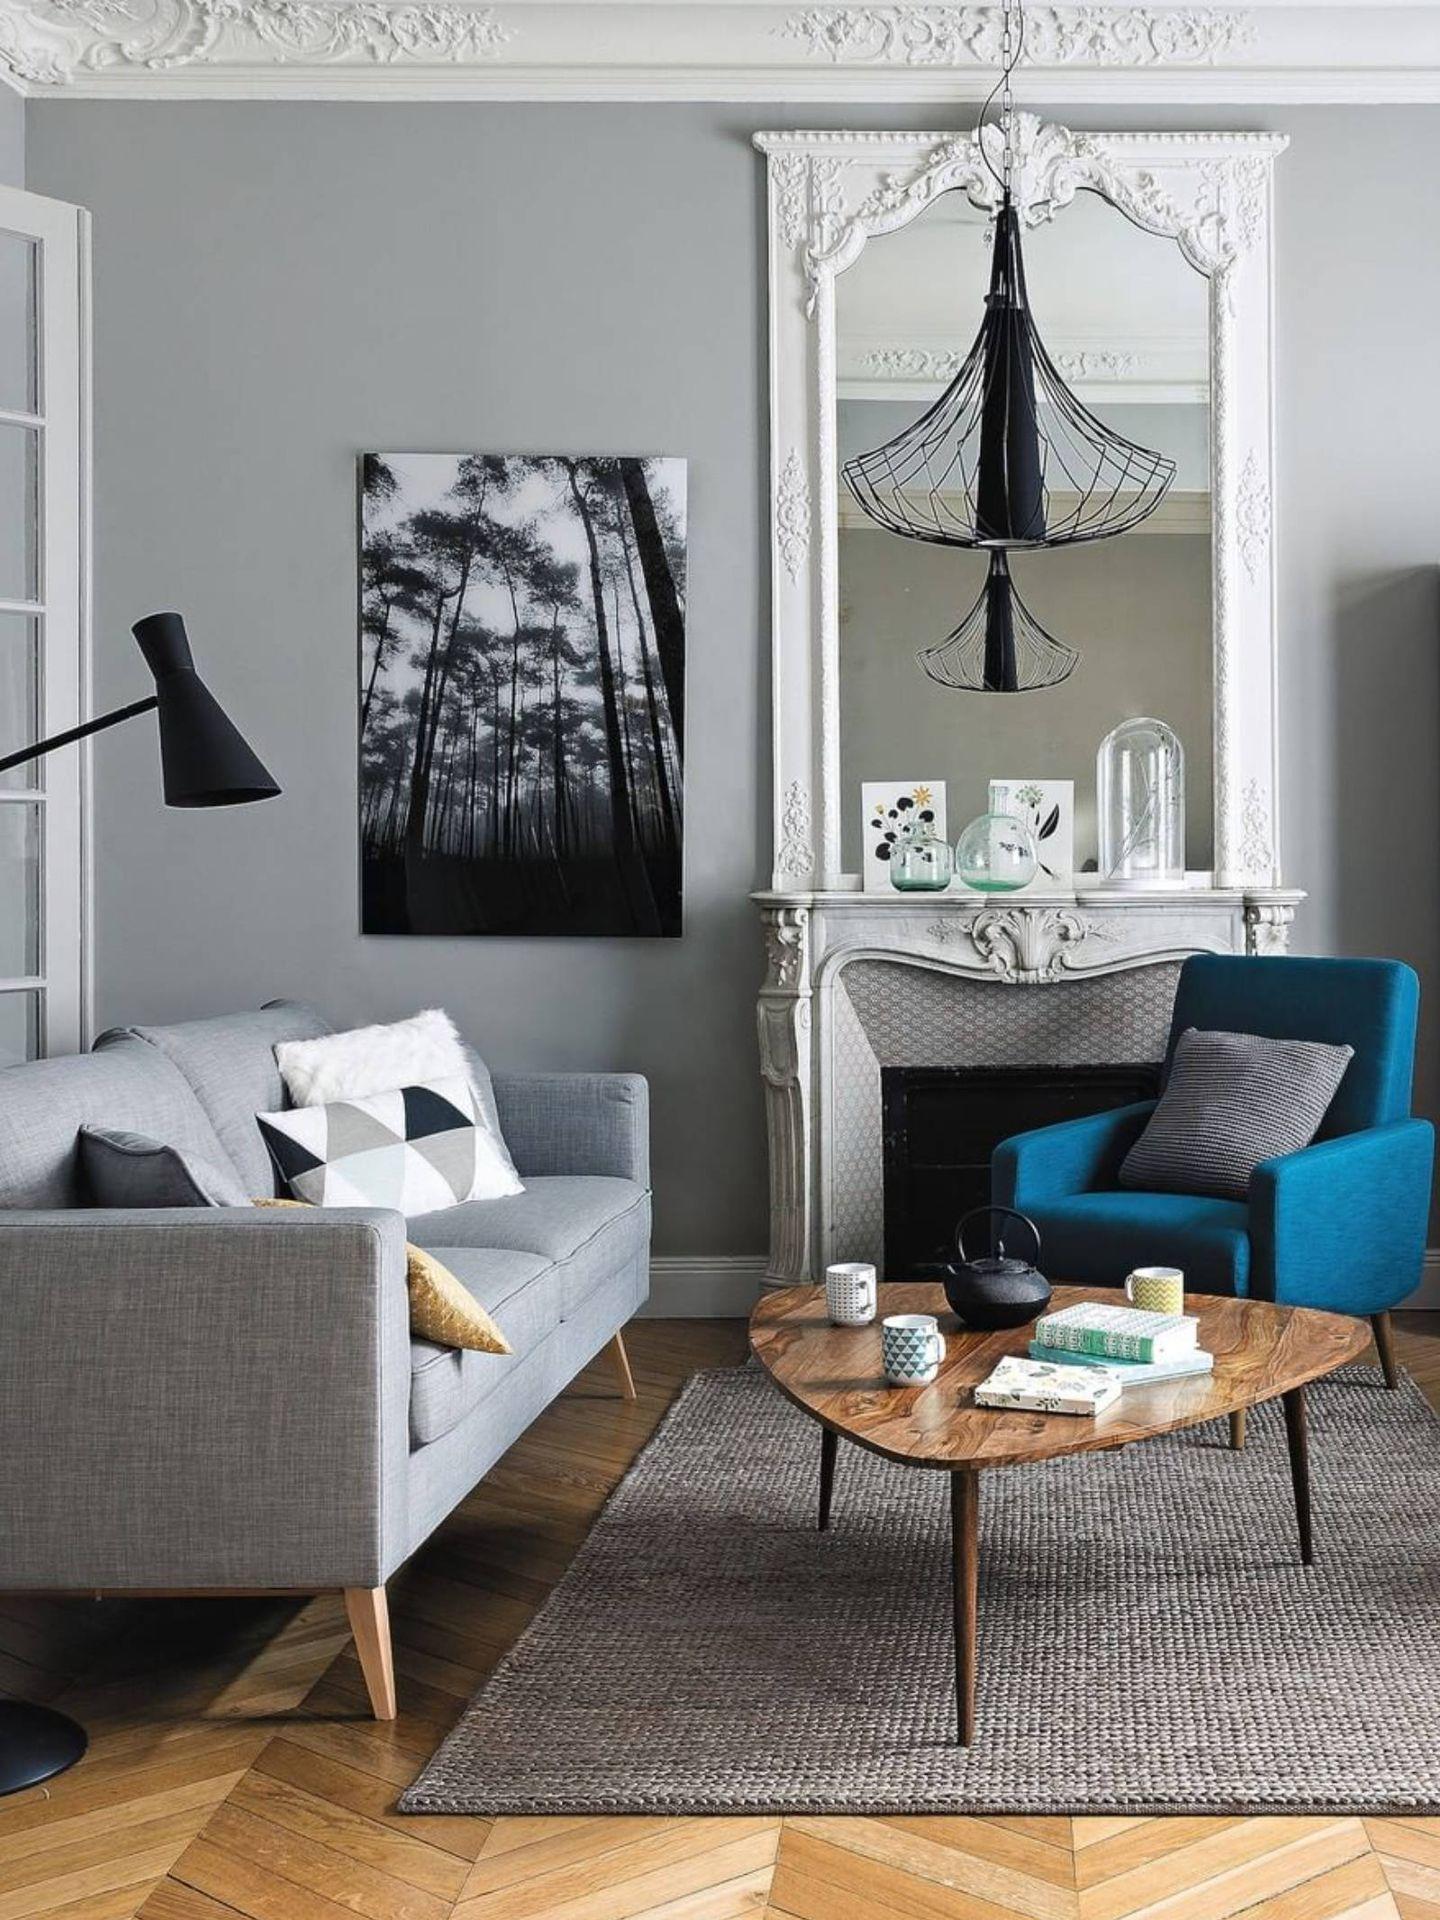 Sillones alegres para decorar tu salón con Maisons du Monde. (Instagram @maisonsdumonde_es)